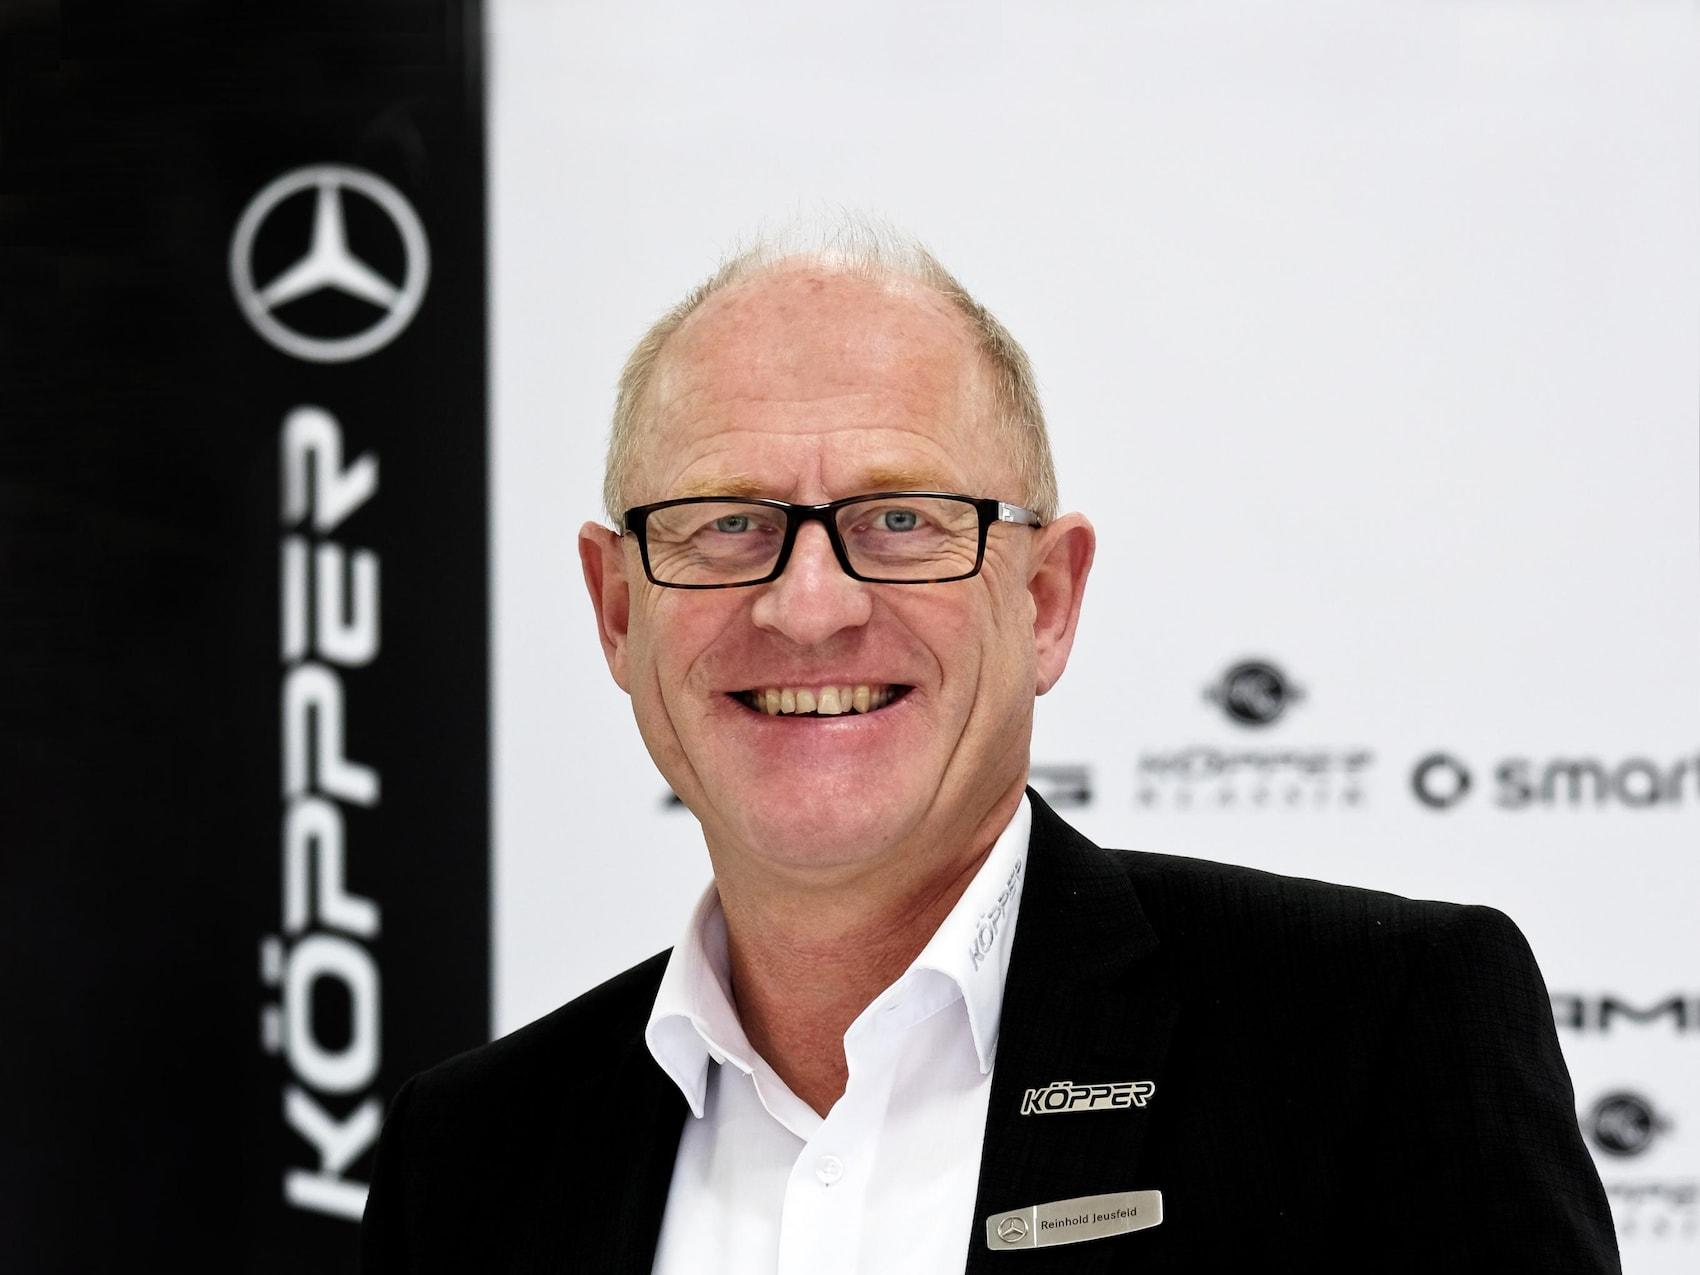 Auto-Koepper-Reinhold-Jeusfeld